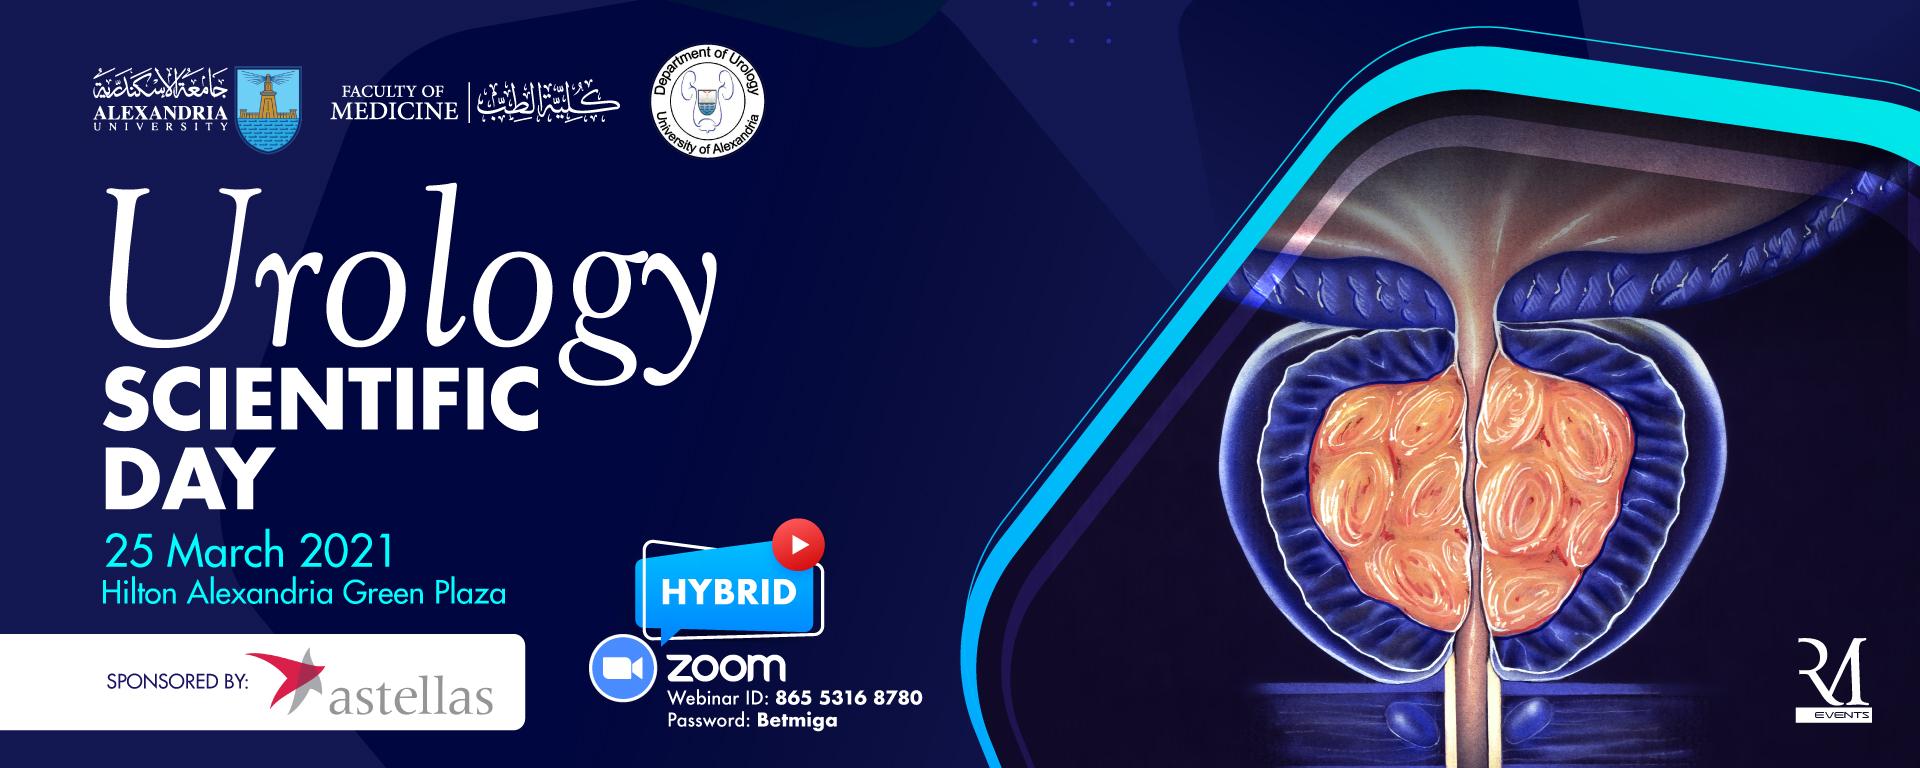 Urology Scientific Day